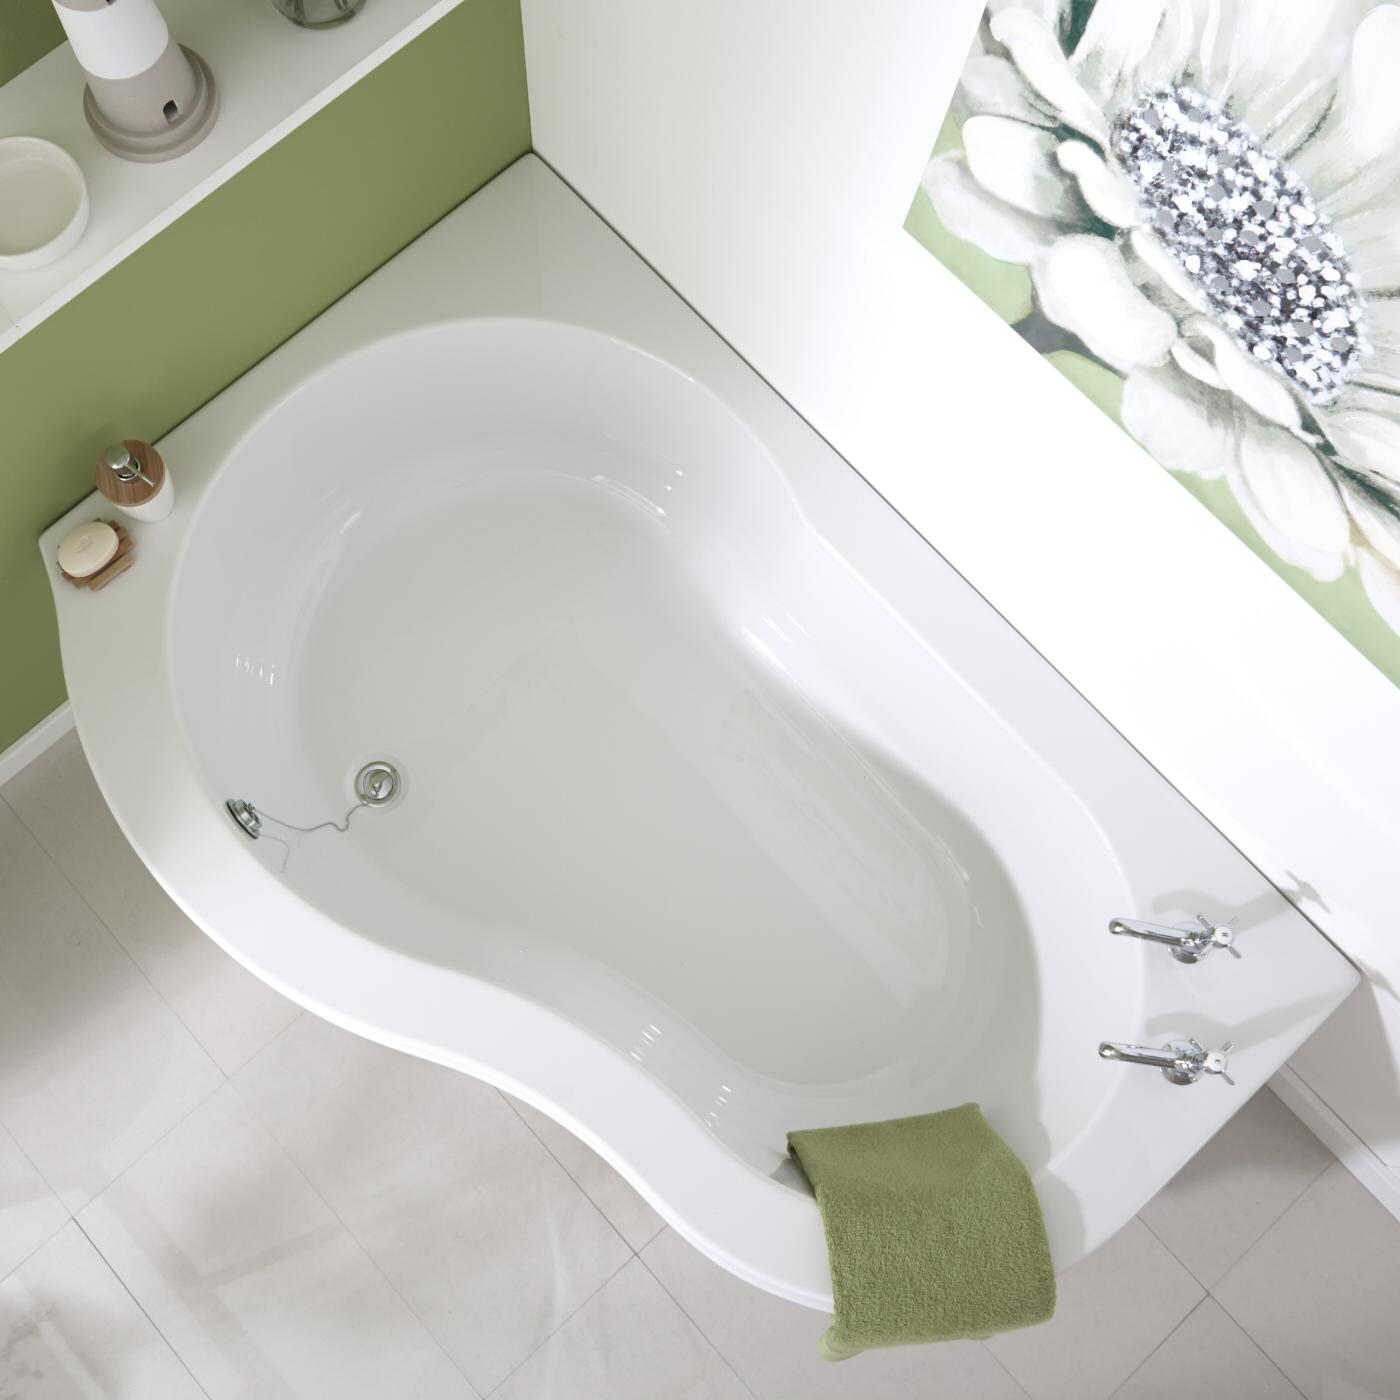 Угловая ванна фигурная